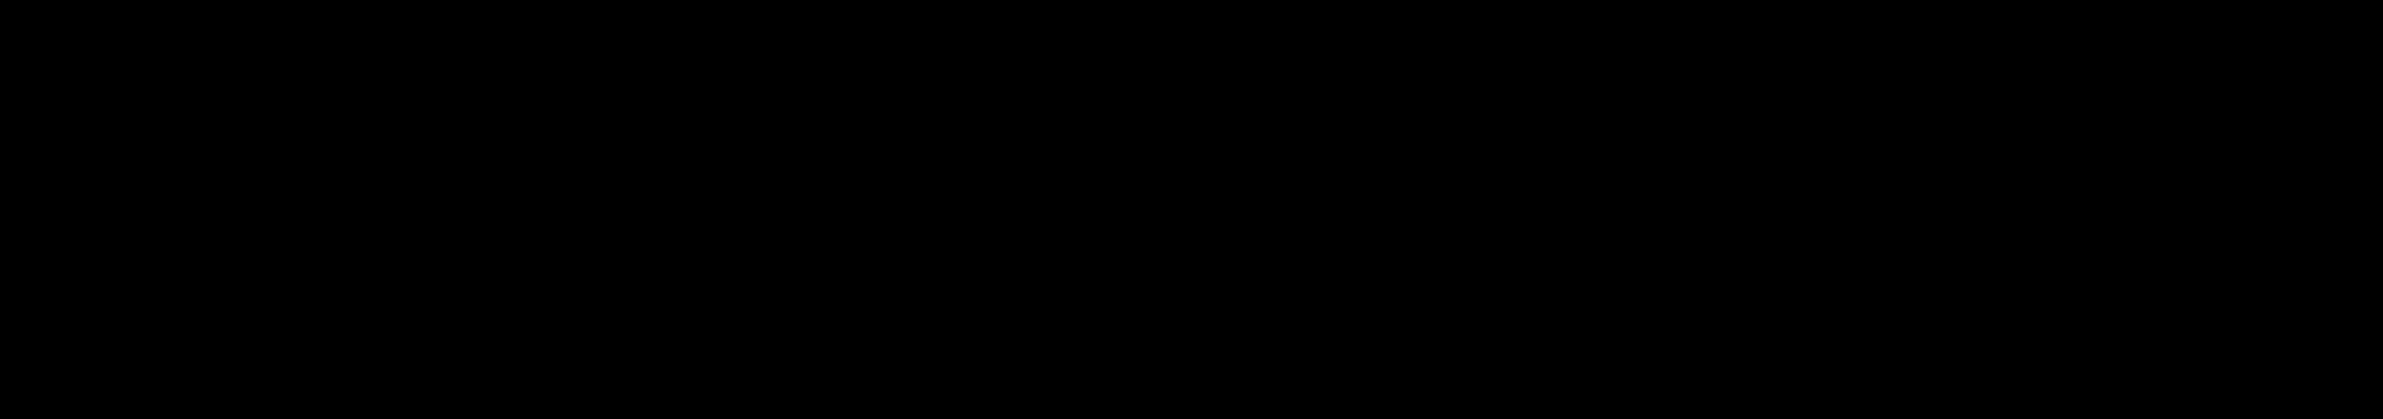 VirtualAd logo